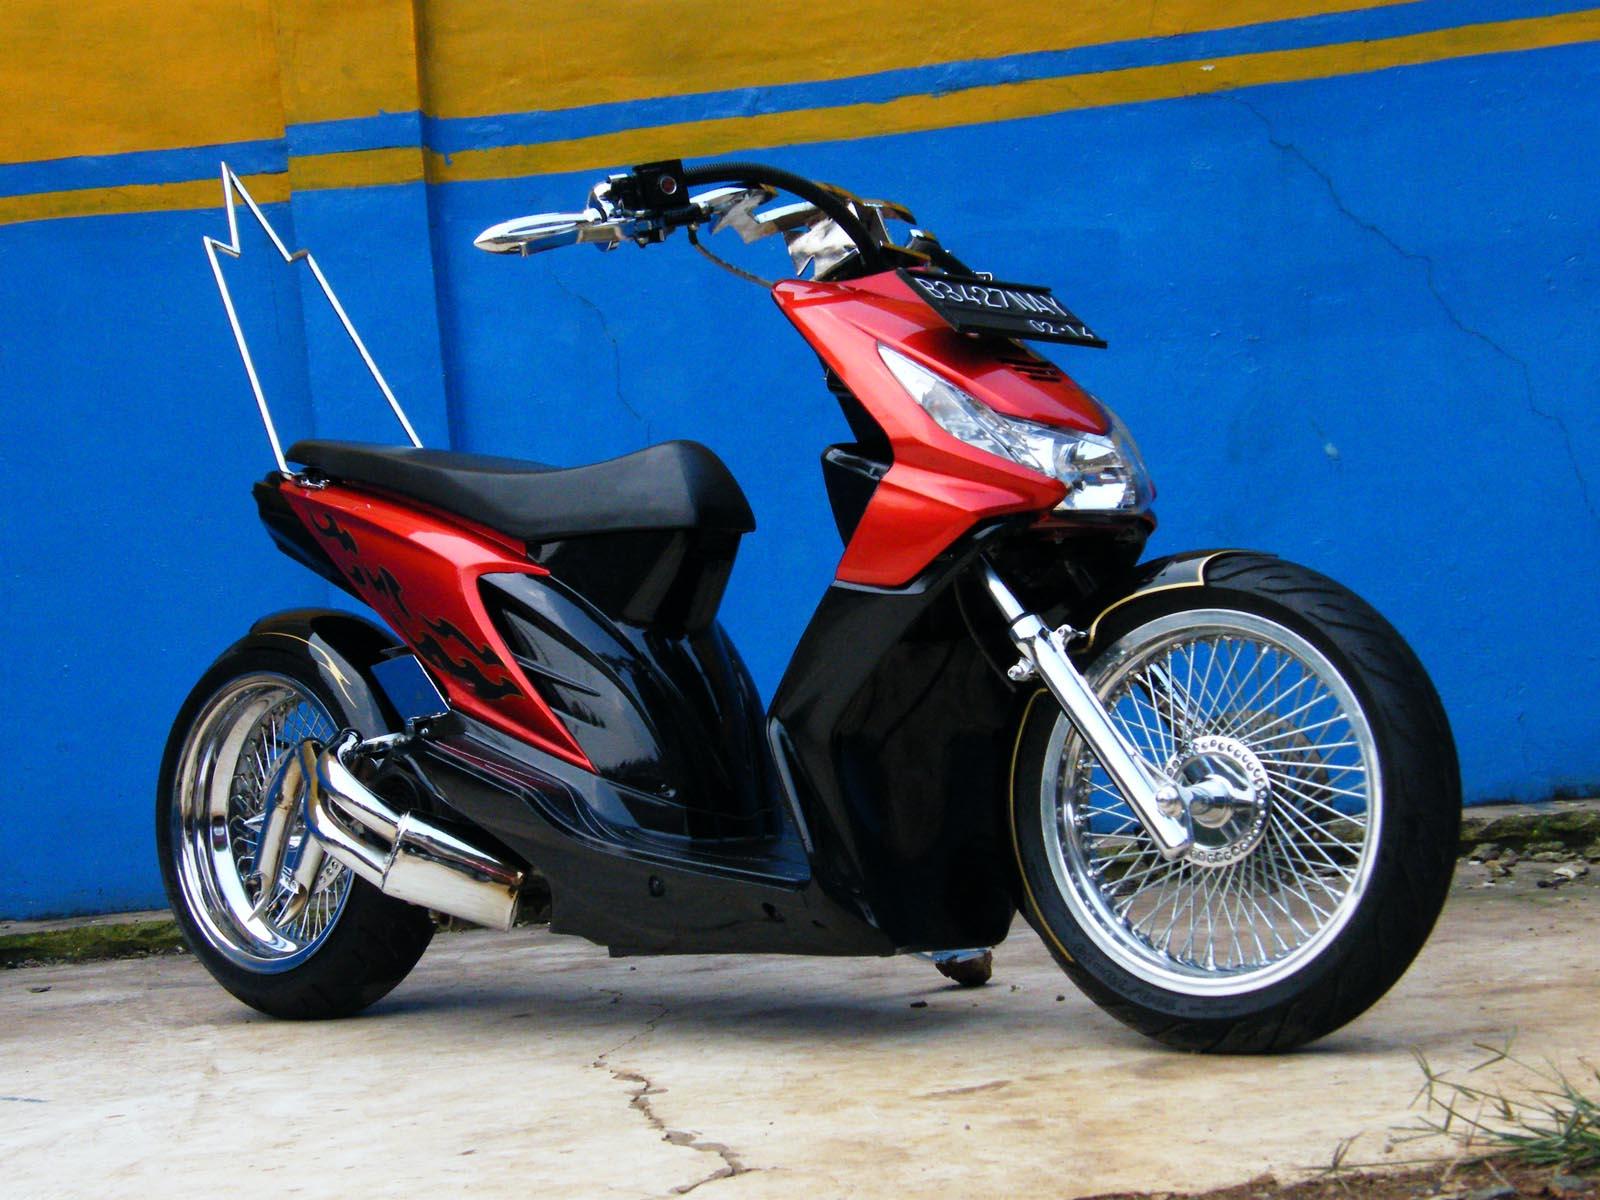 91 2015 Yamaha Motor Terbaru Newhairstylesformen2014com